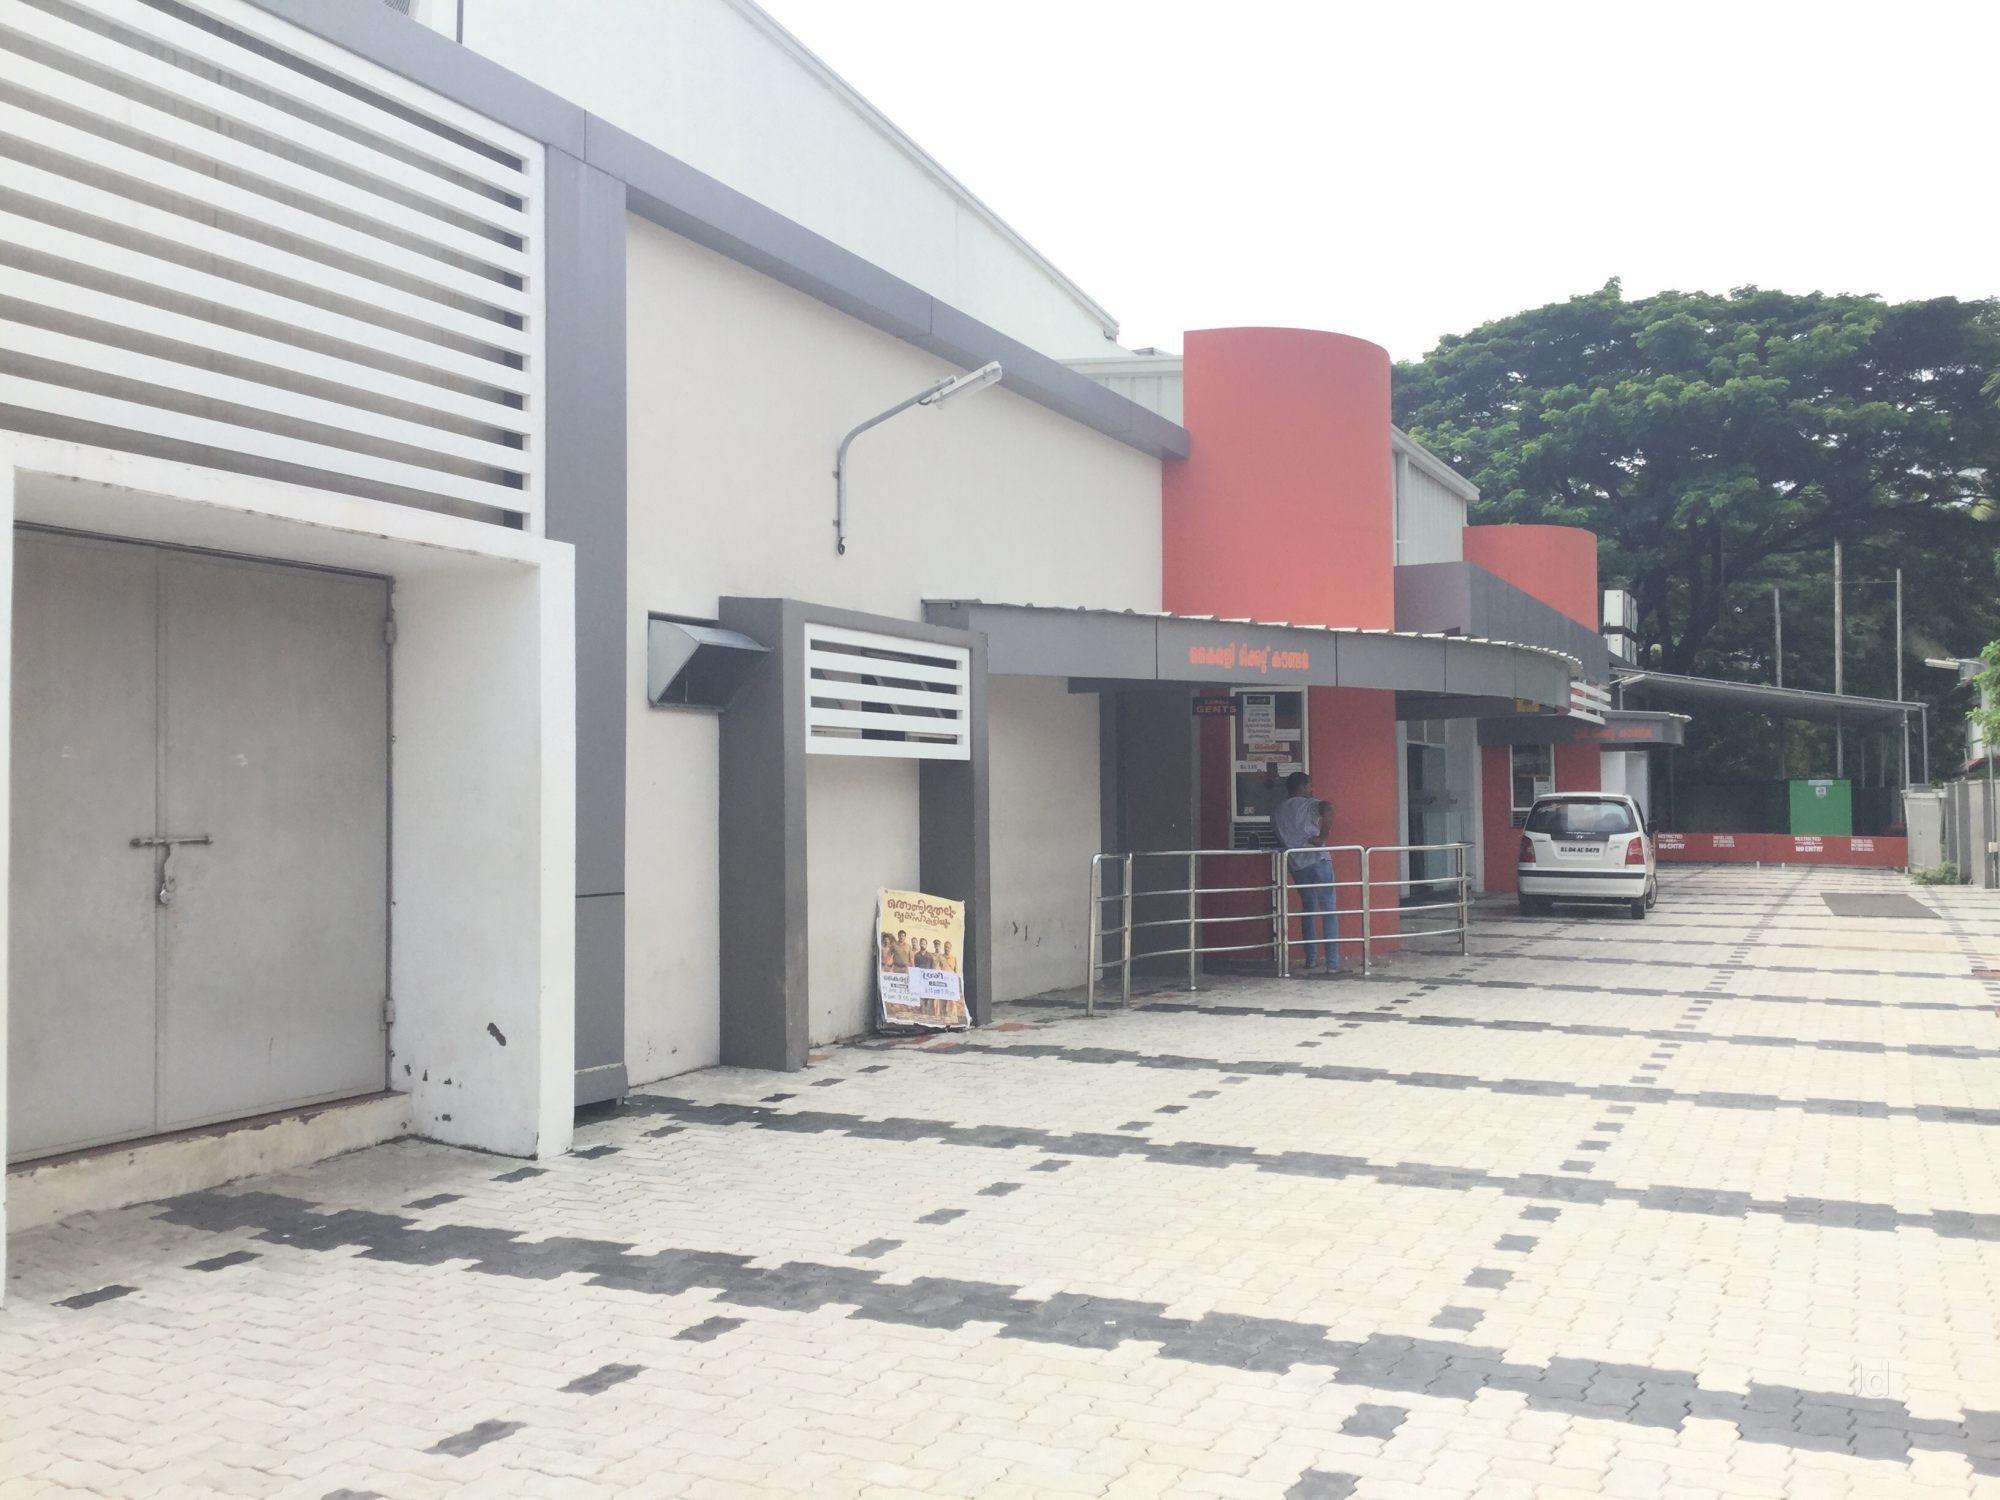 Kairali Theatre, THEATER & MULTIPLEX,  service in Mullakkal, Alappuzha